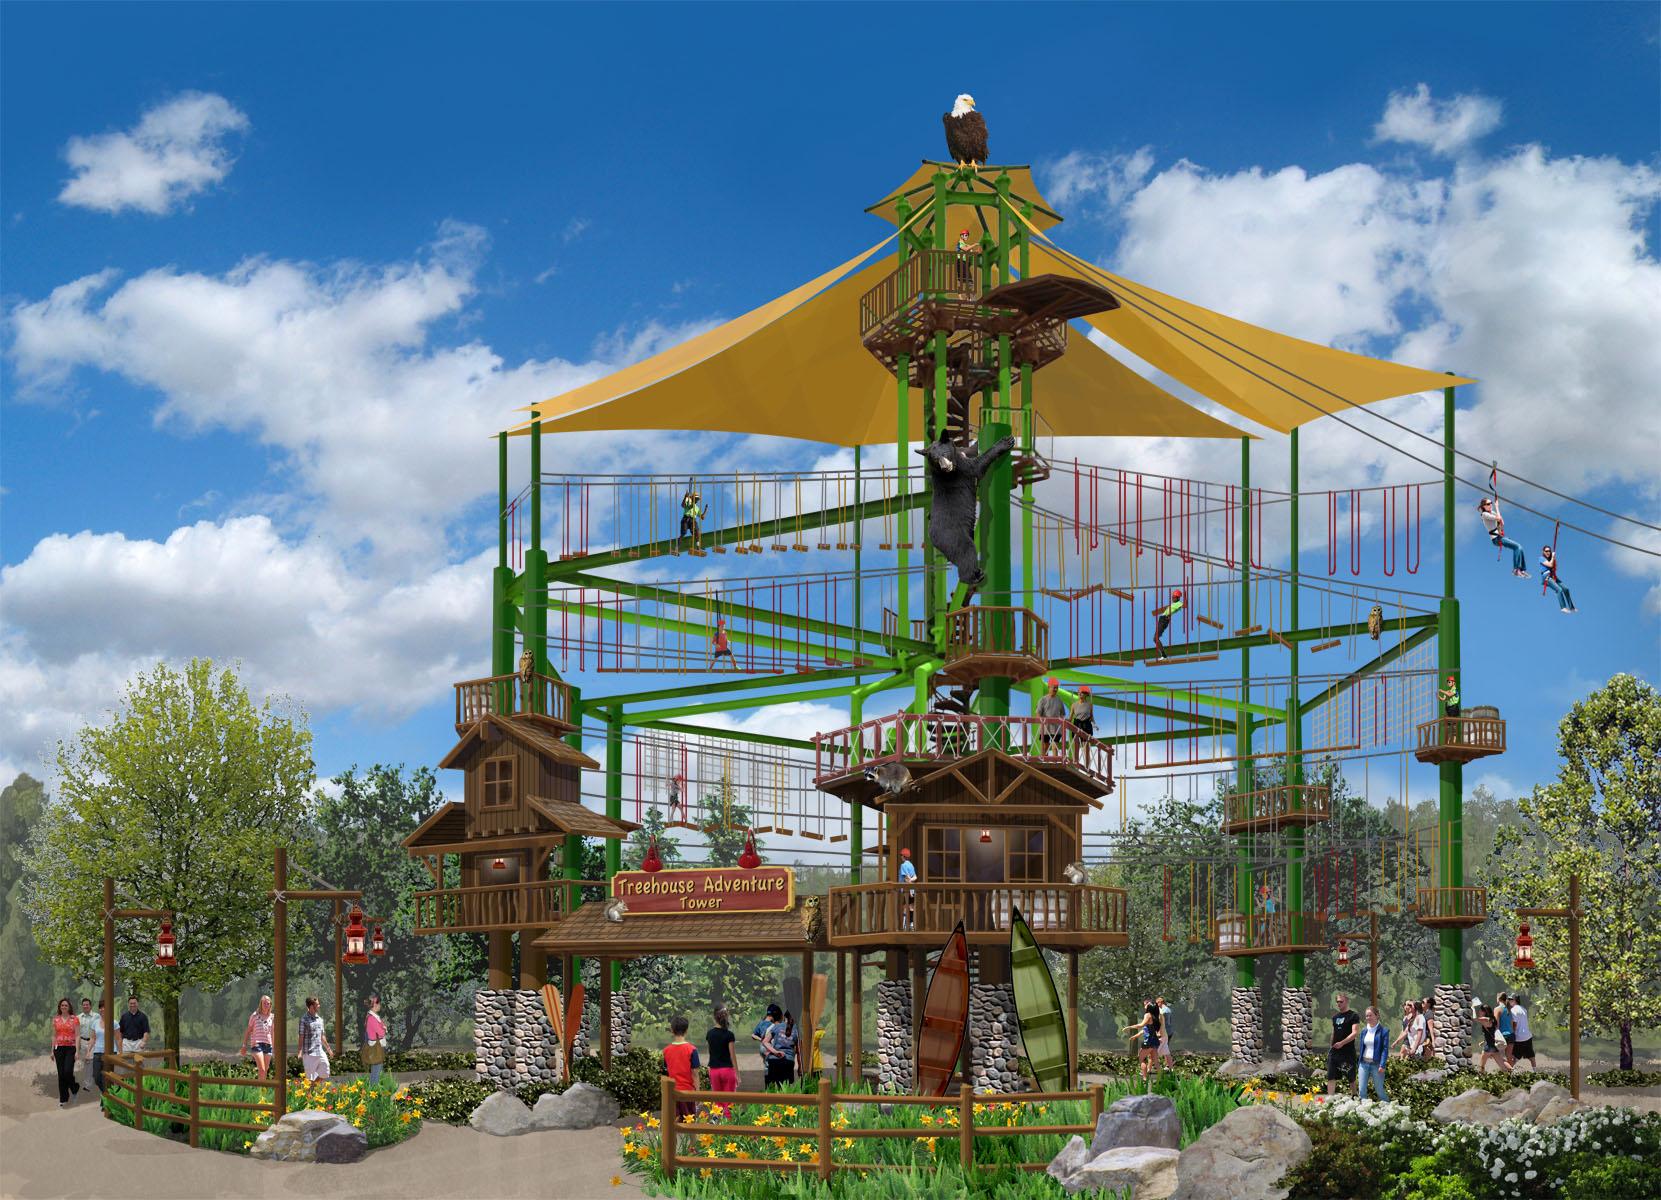 Treehouse Adventure Tower R&R Creative Amusement Designs Anaheim, CA